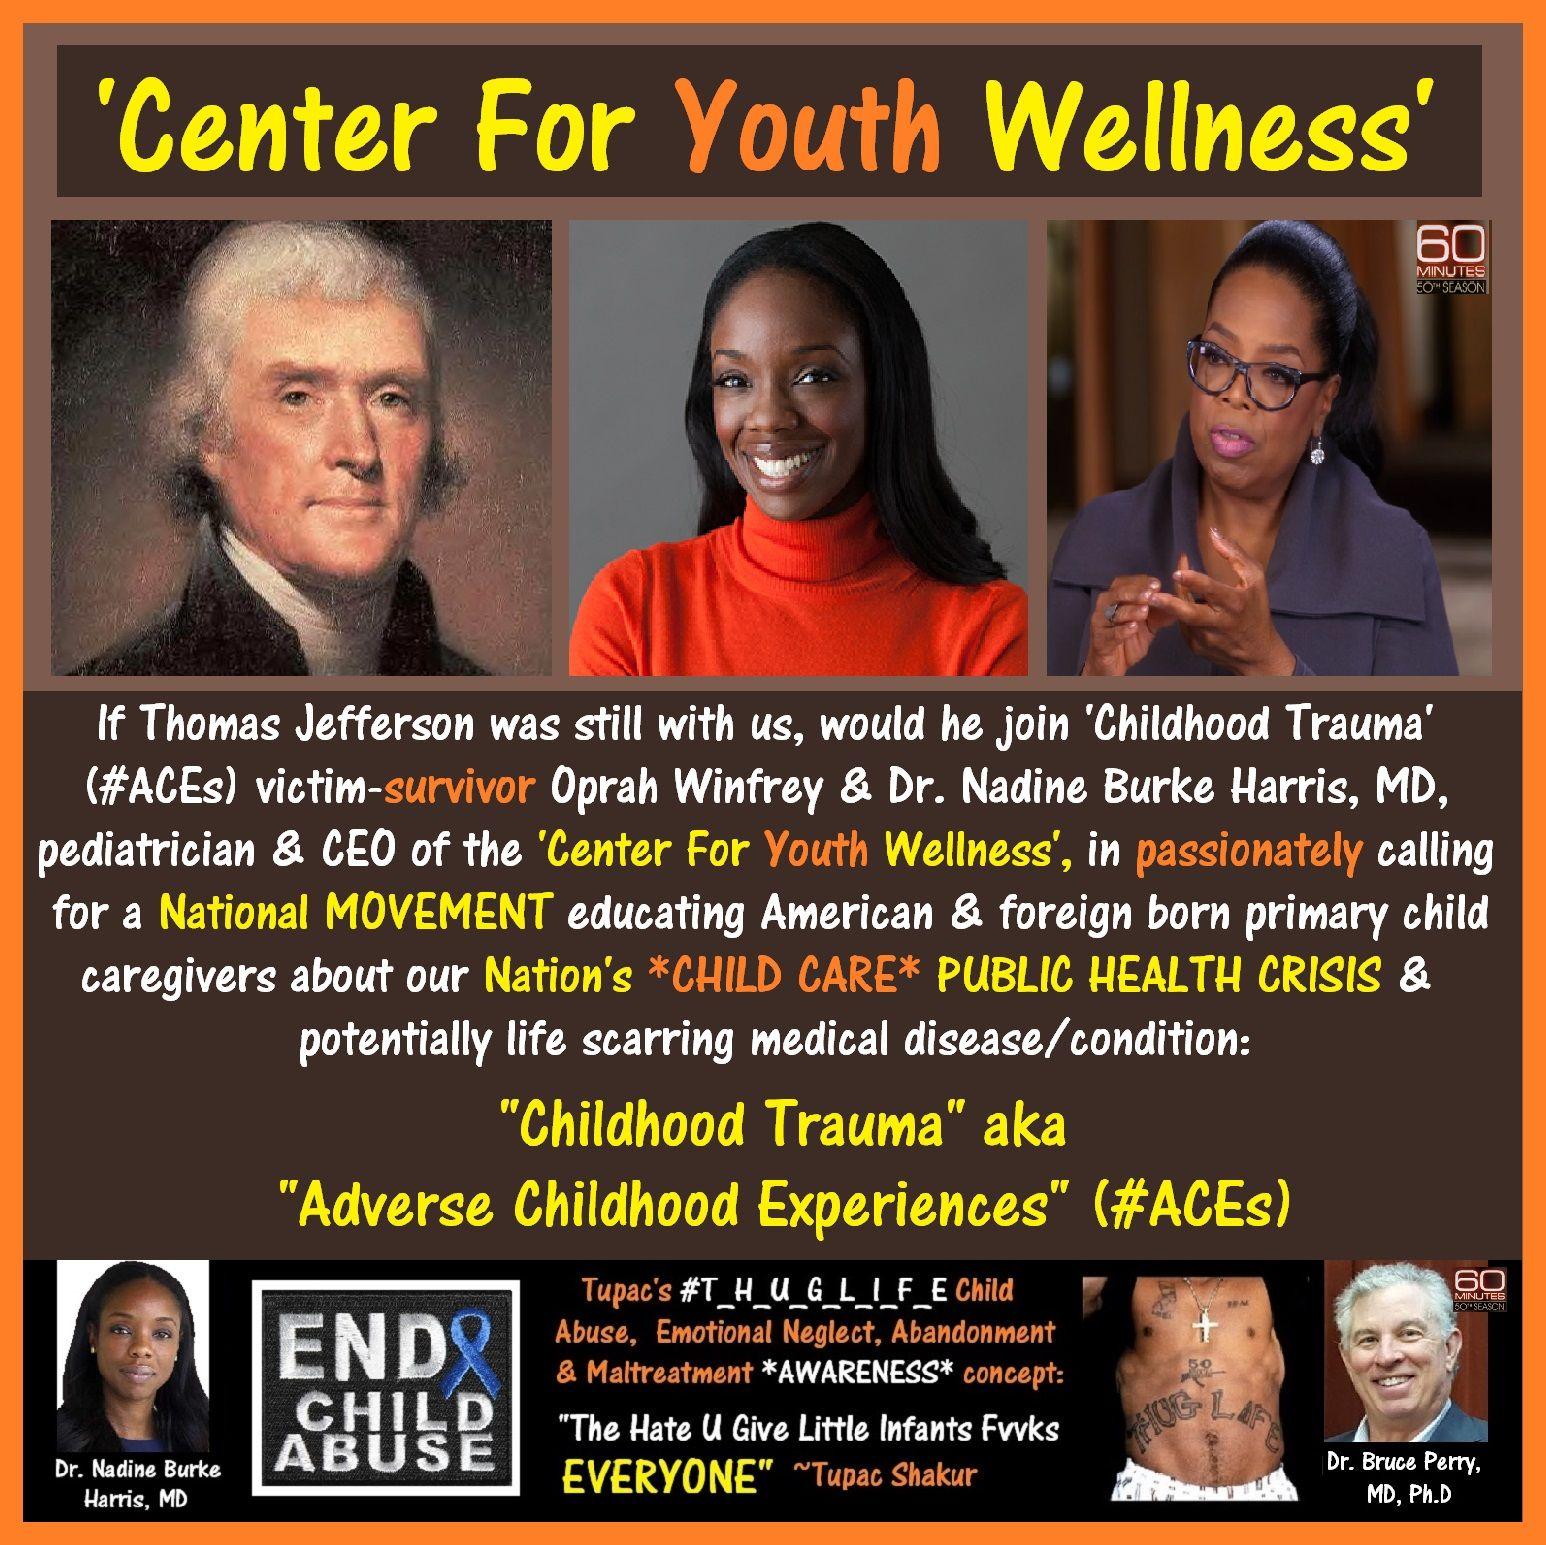 Thomas Jefferson, Oprah Winfrey, Dr. Nadine Burke Harris.jpg